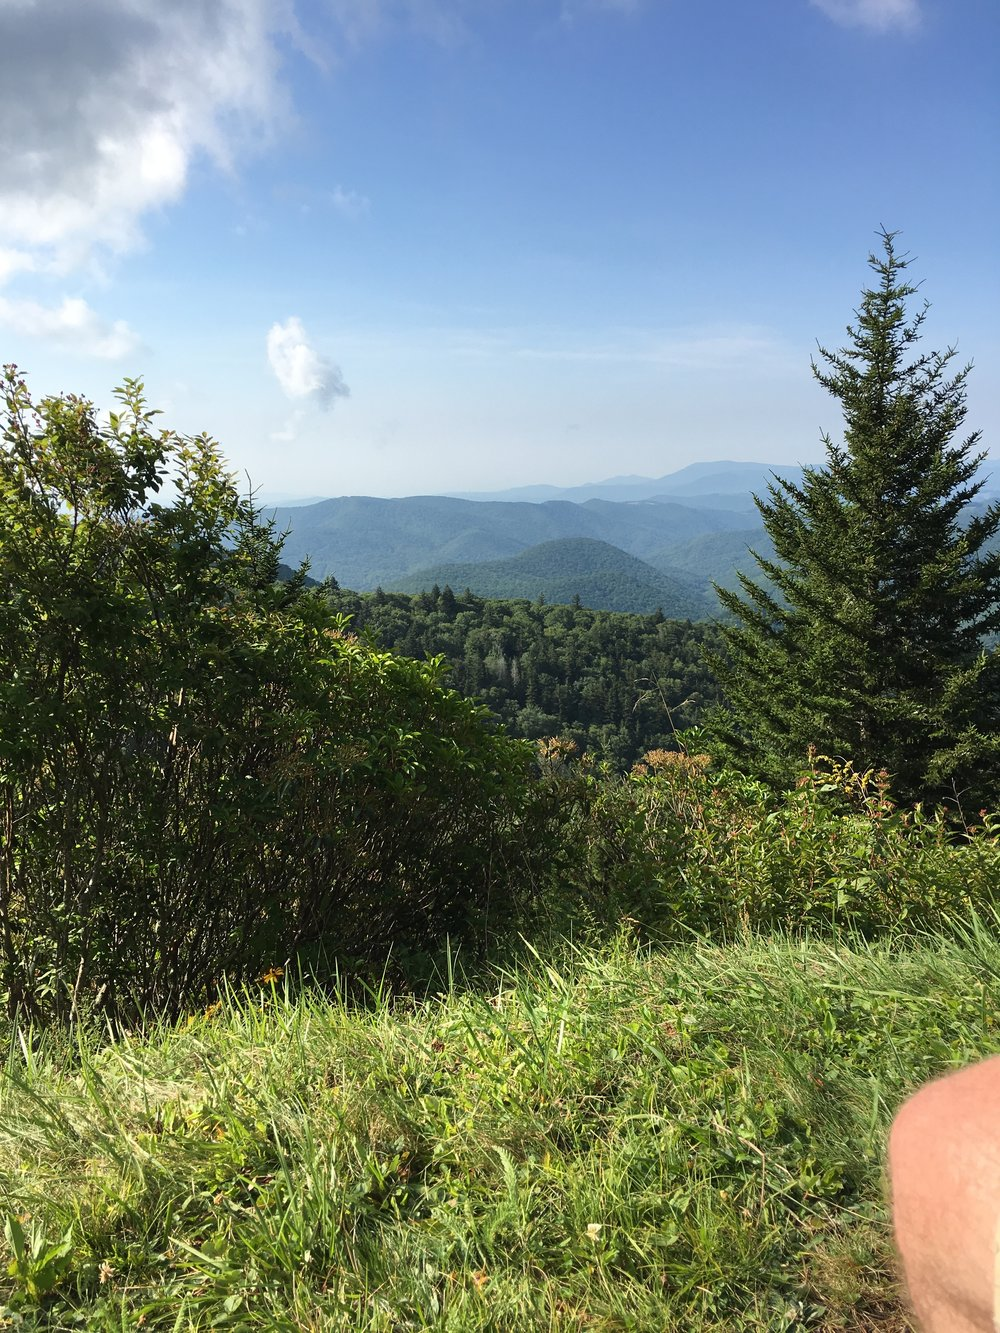 Blue-ridge-parkway-asheville-nc